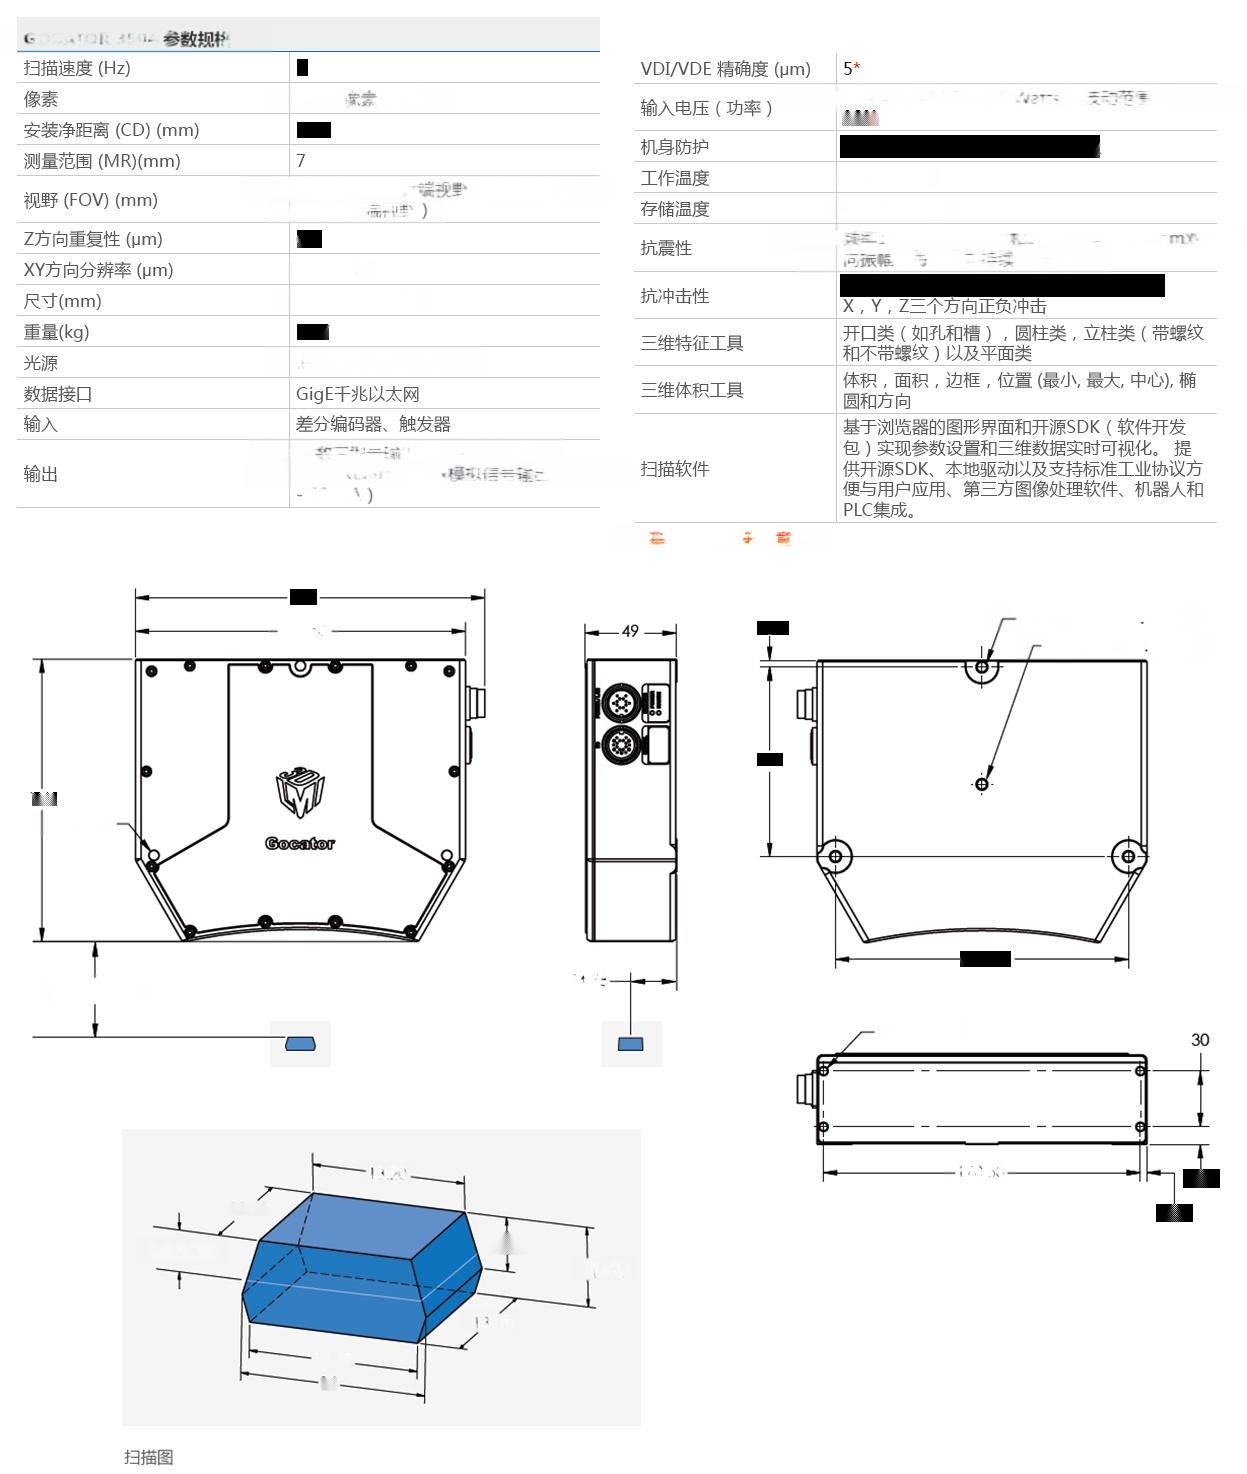 LMI Gocator3D视觉传感器报价,型号115871225